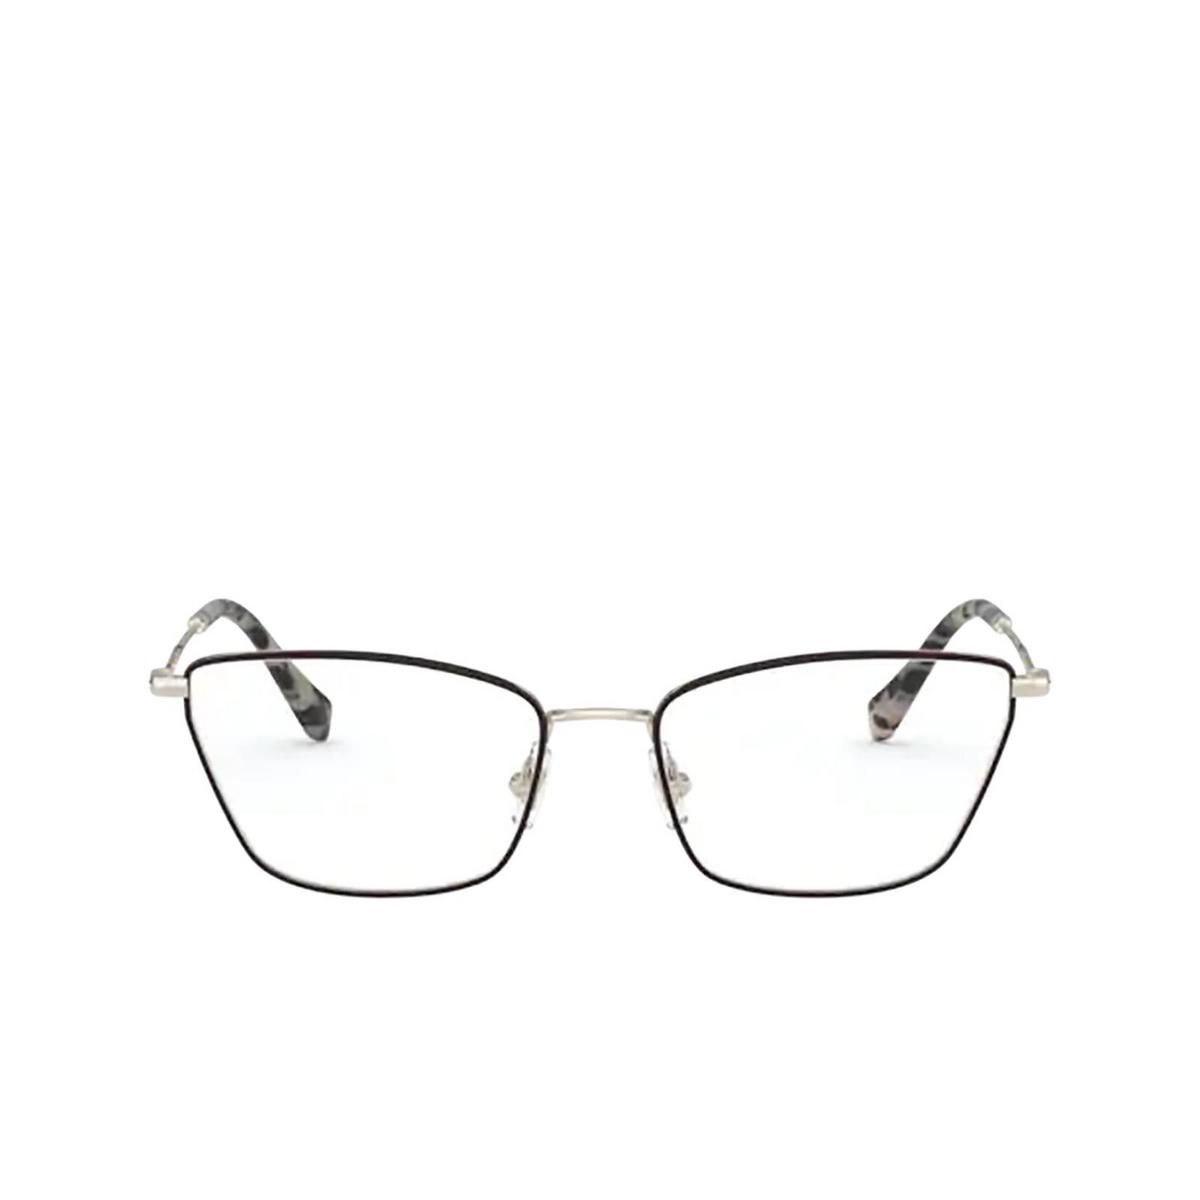 Miu Miu® Cat-eye Eyeglasses: MU 52SV color Pale Gold / Bordeaux 09B1O1 - front view.